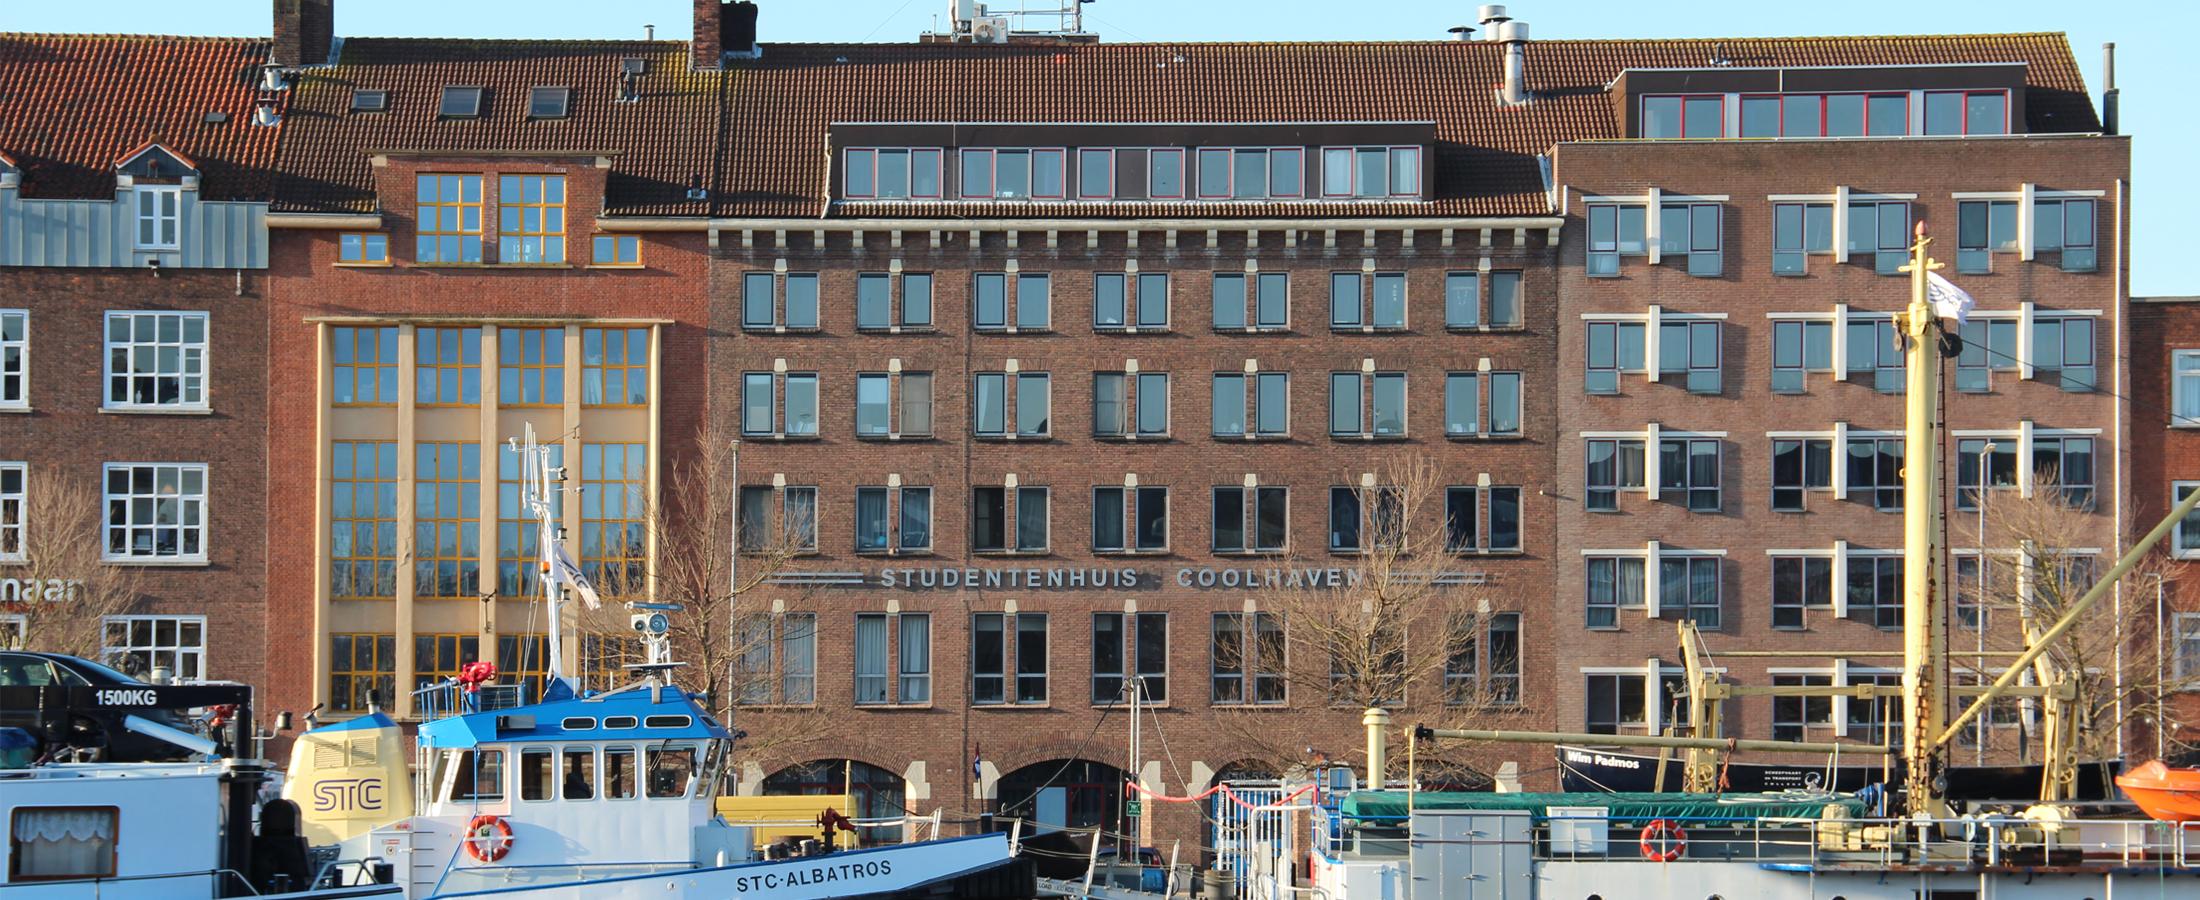 Coolhavengebouw, Rotterdam